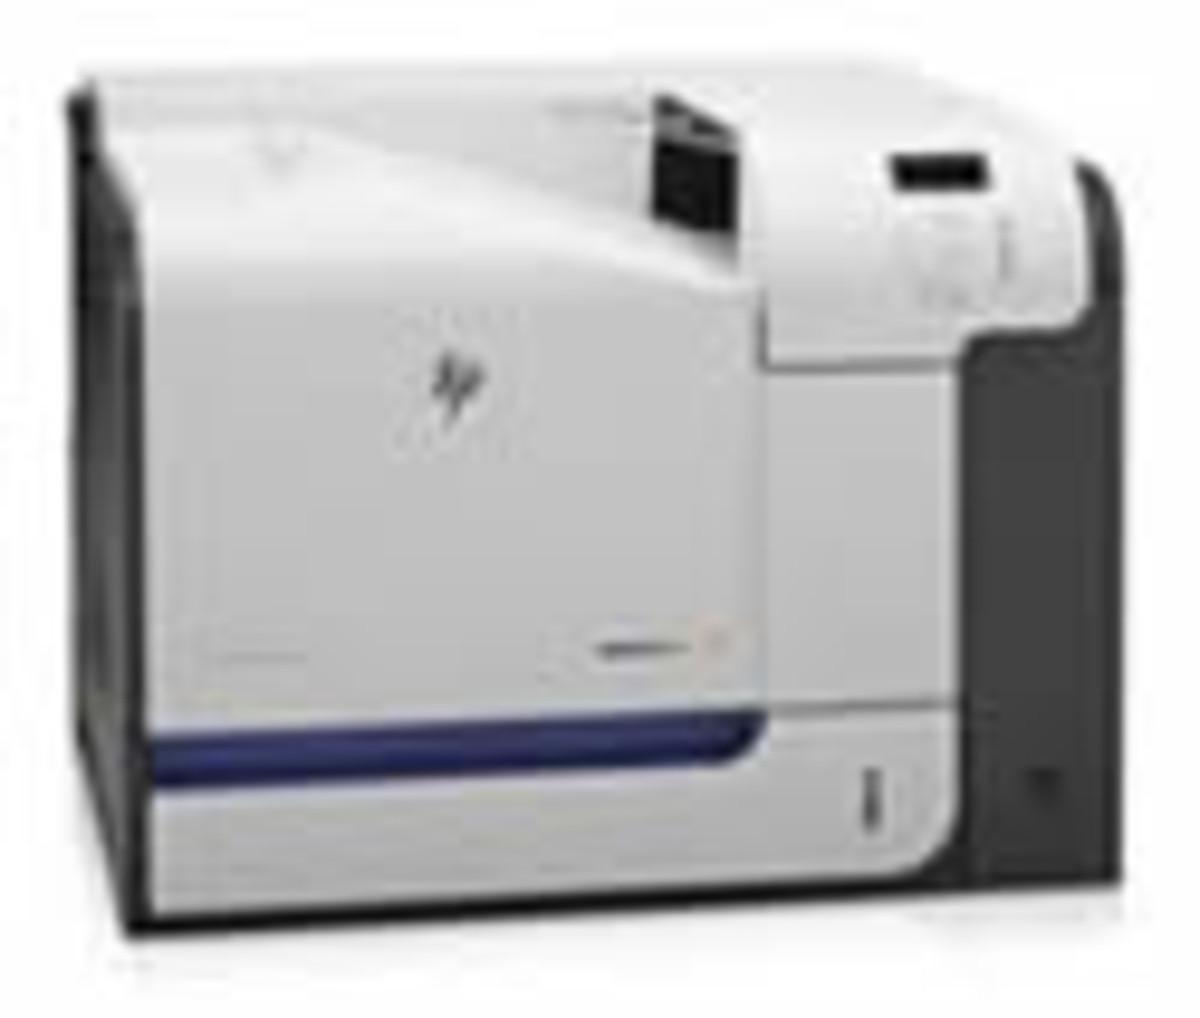 HP Colour LaserJet Enterprise 500 M551n Laser Printer